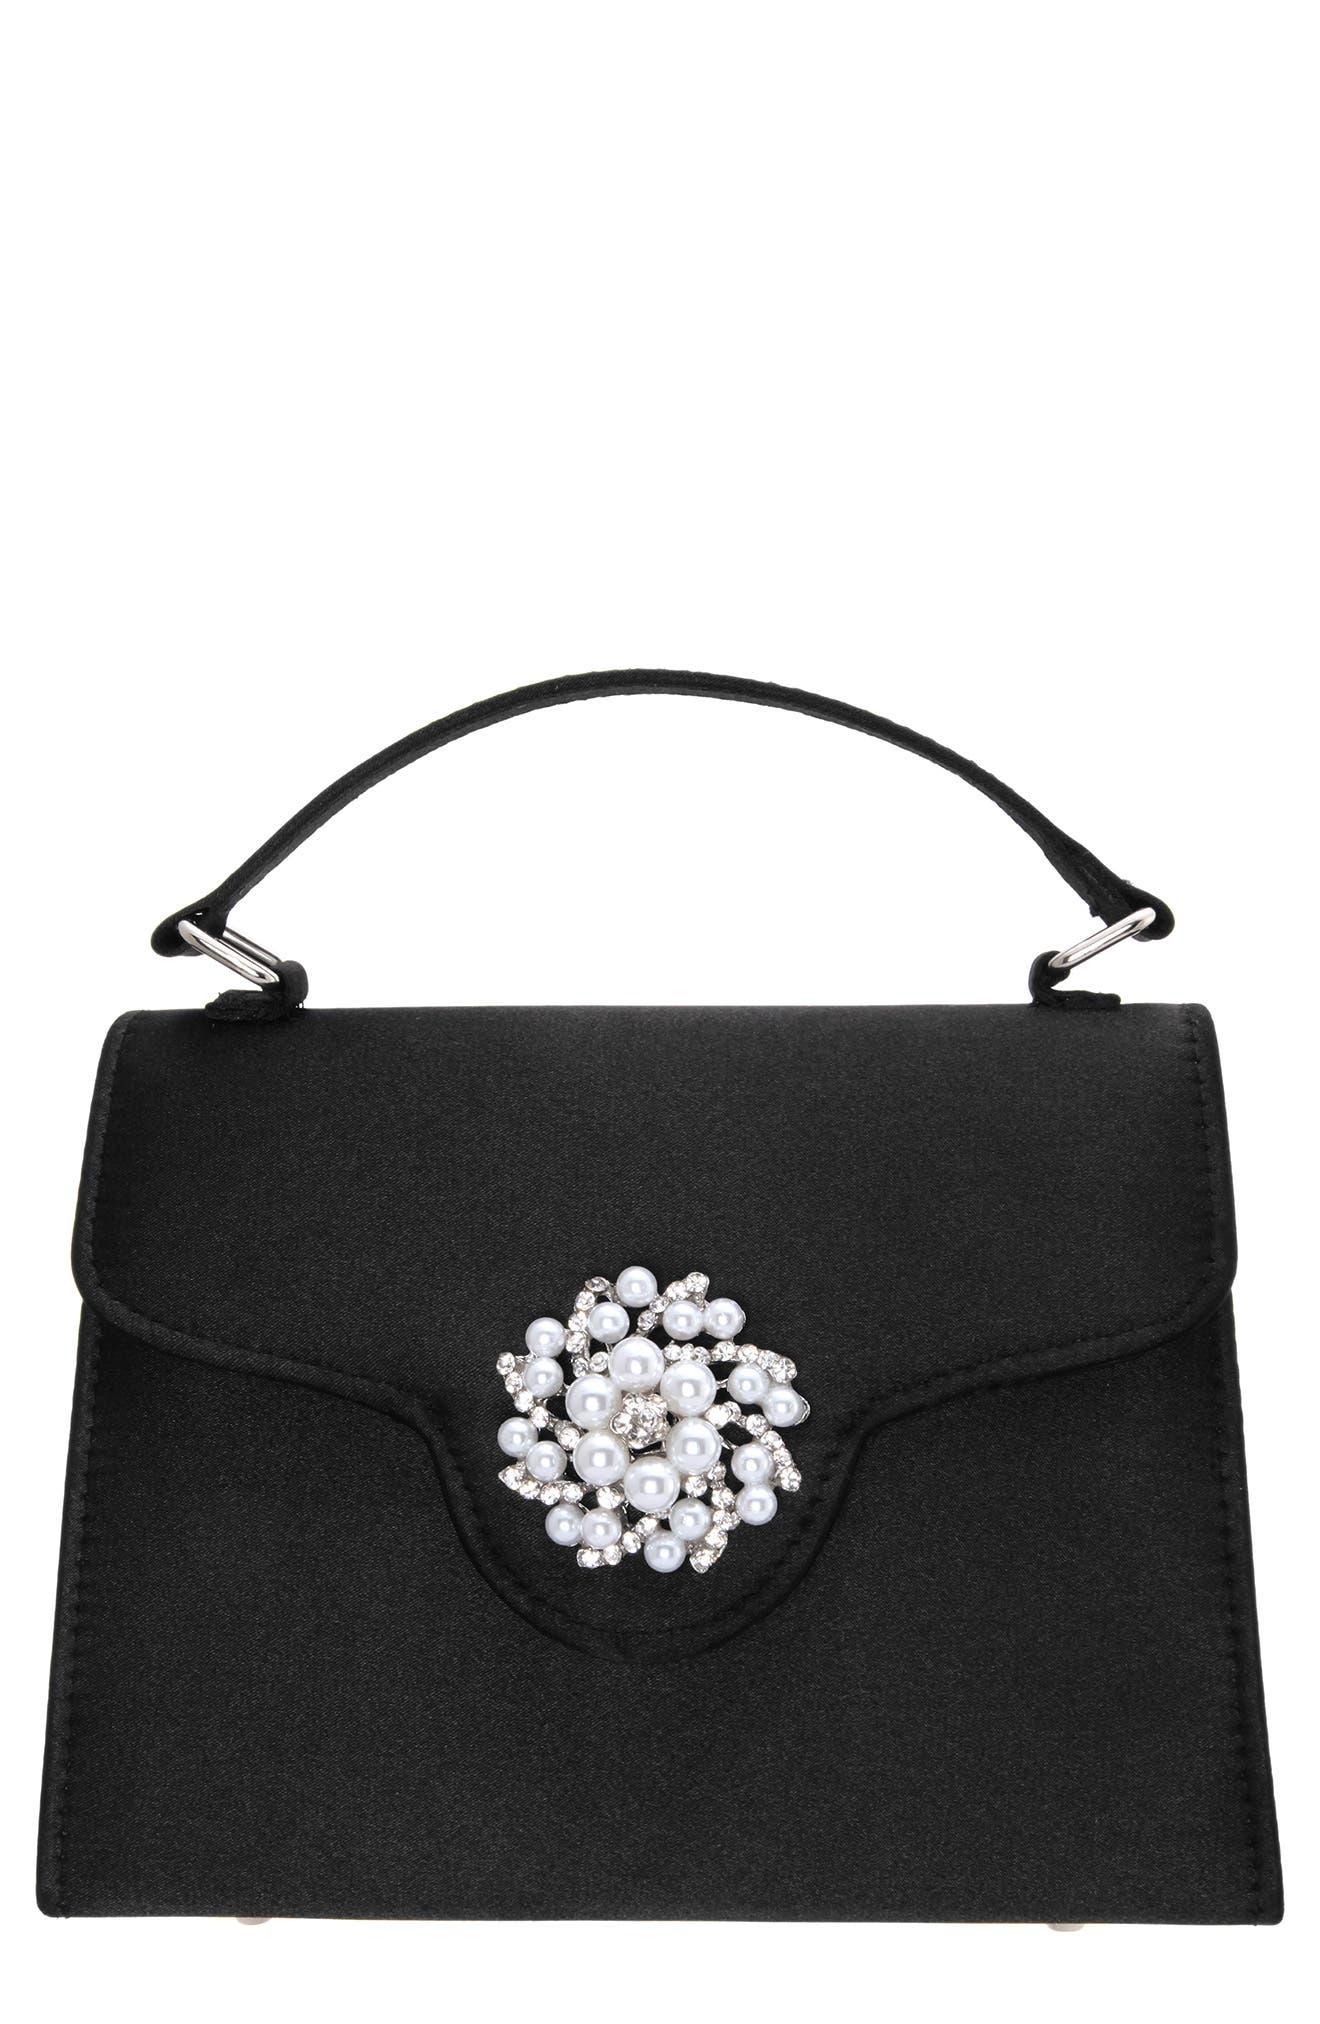 Imitation Pearl Ornament Lady Bag - Black